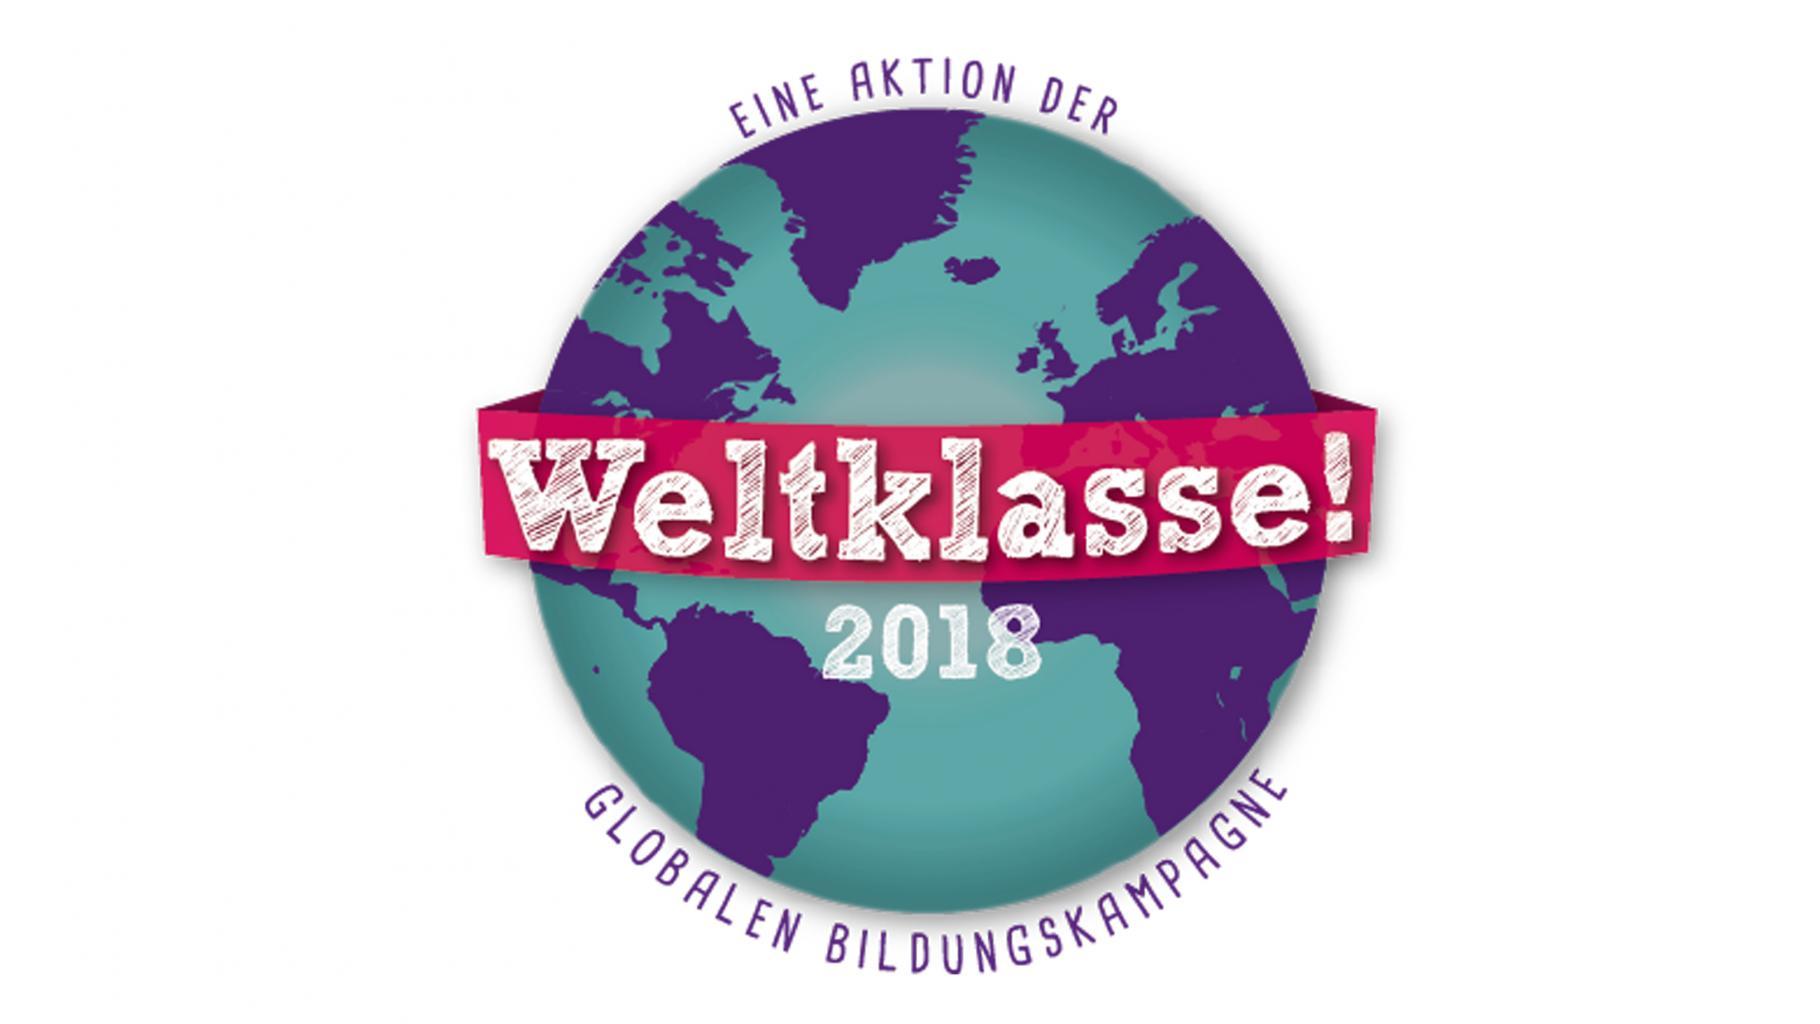 Weltklasse-Siegel 2018, GBK, Globale Bildungskampagne, Schulsiegel